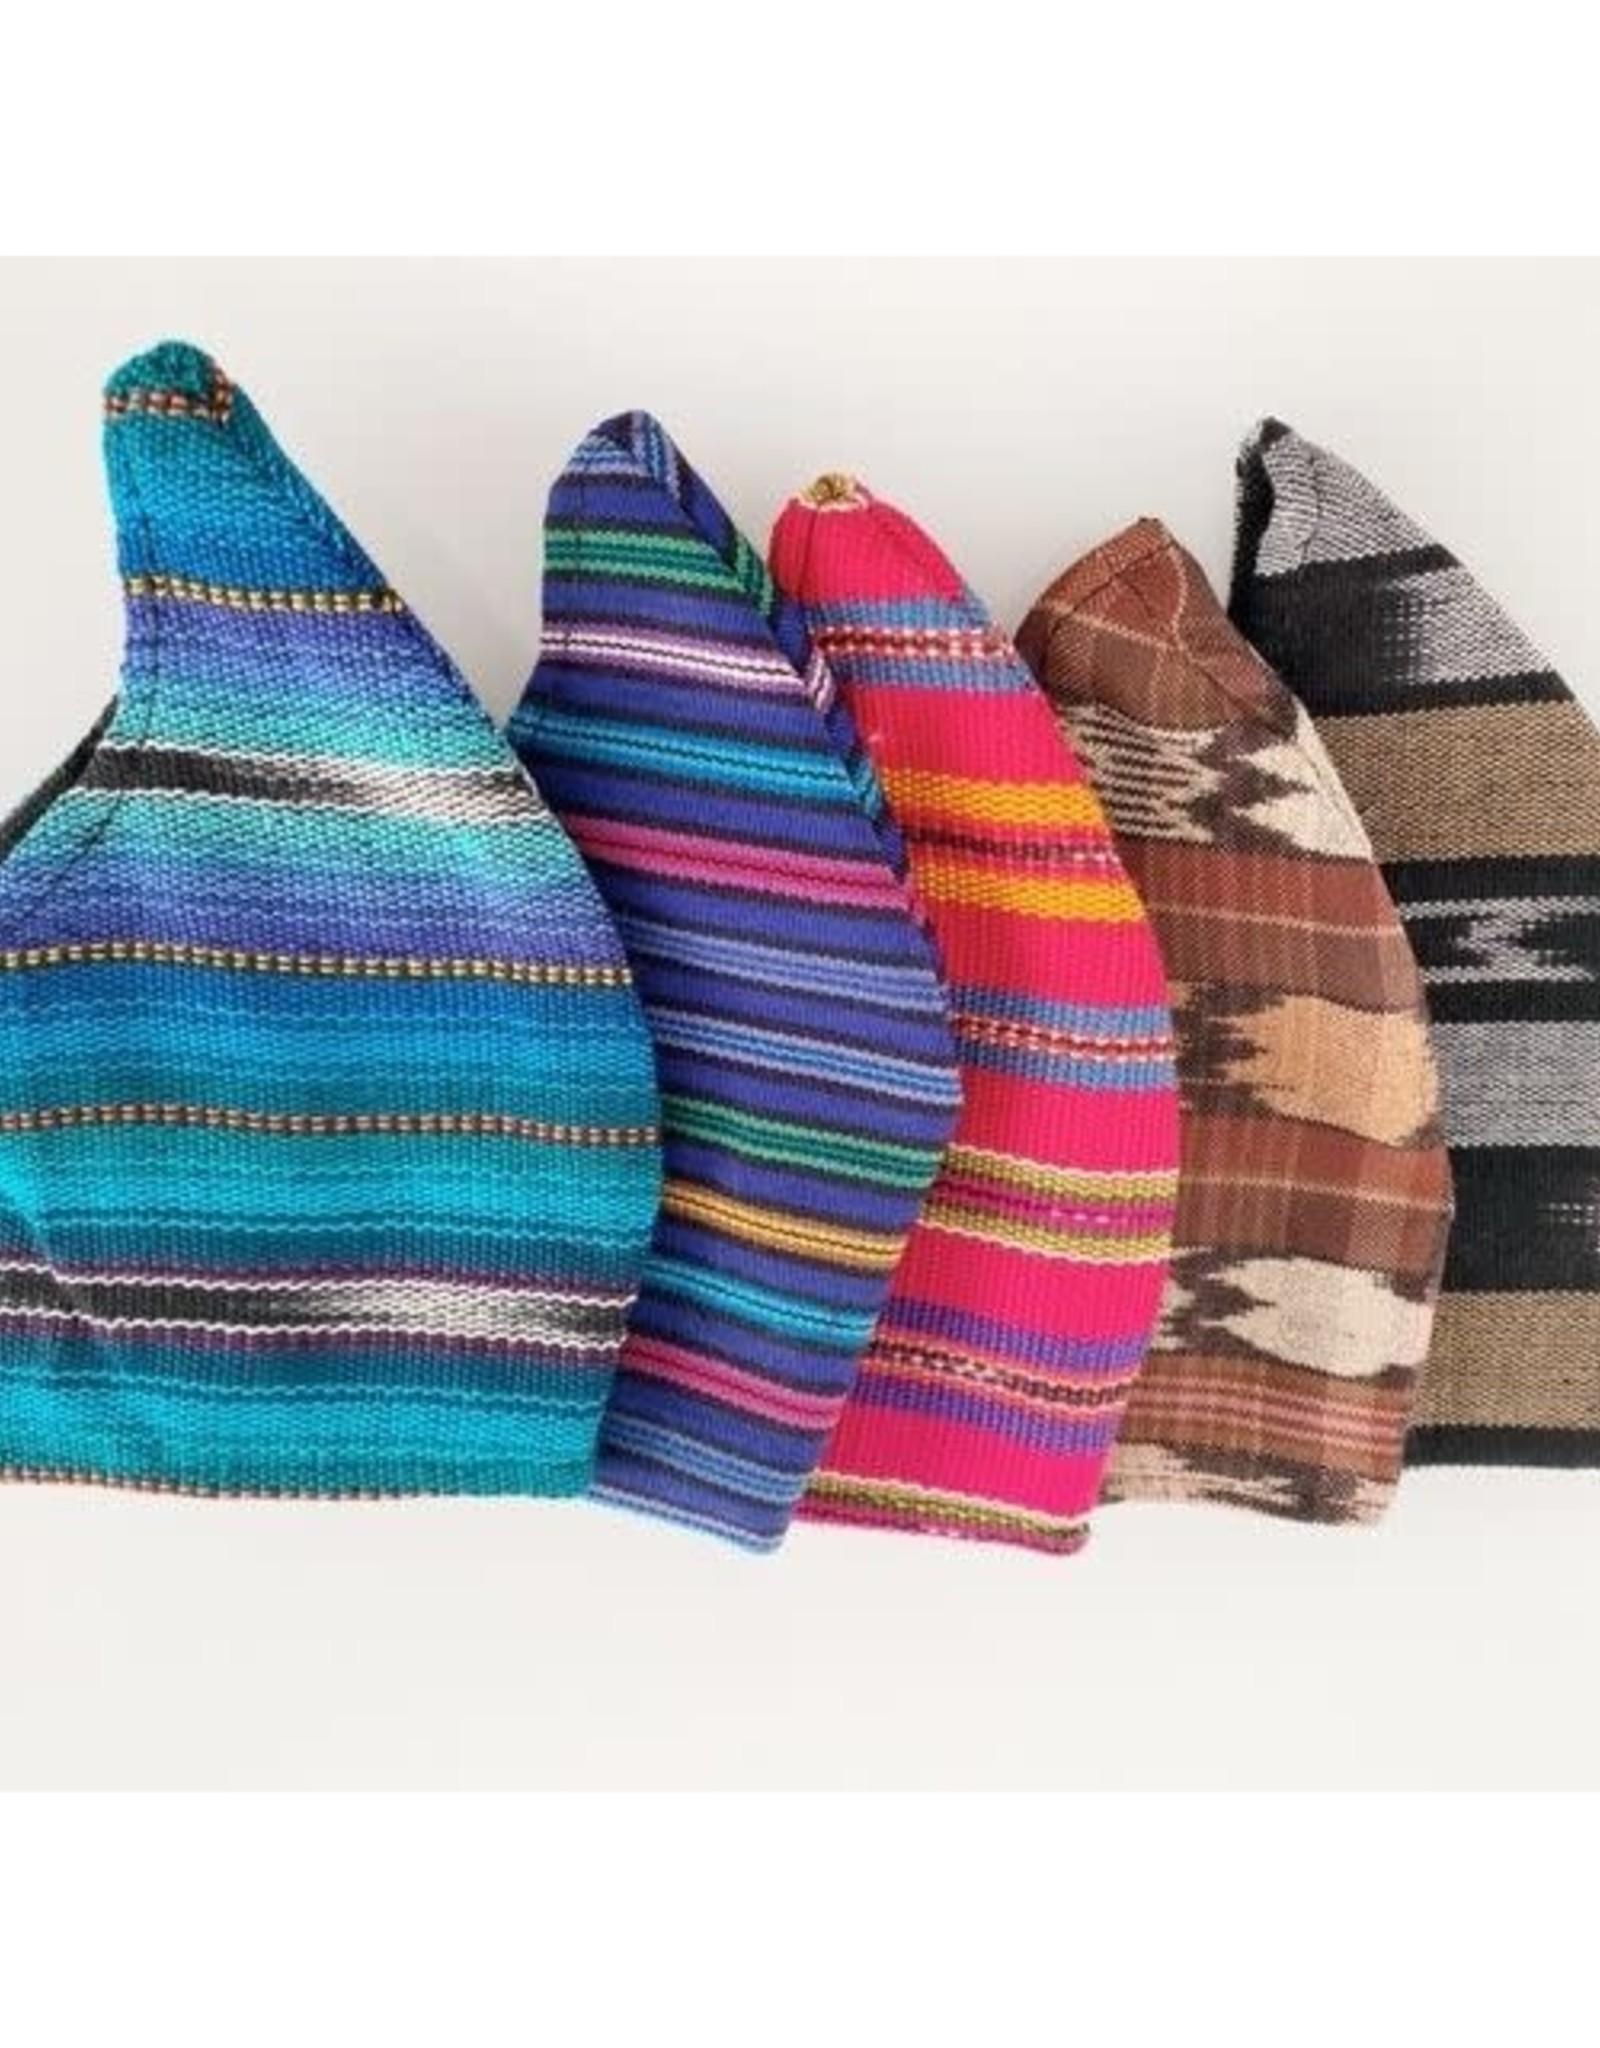 Duckbill Ikat Masks w/ Filter Pocket, Adults, Large Size